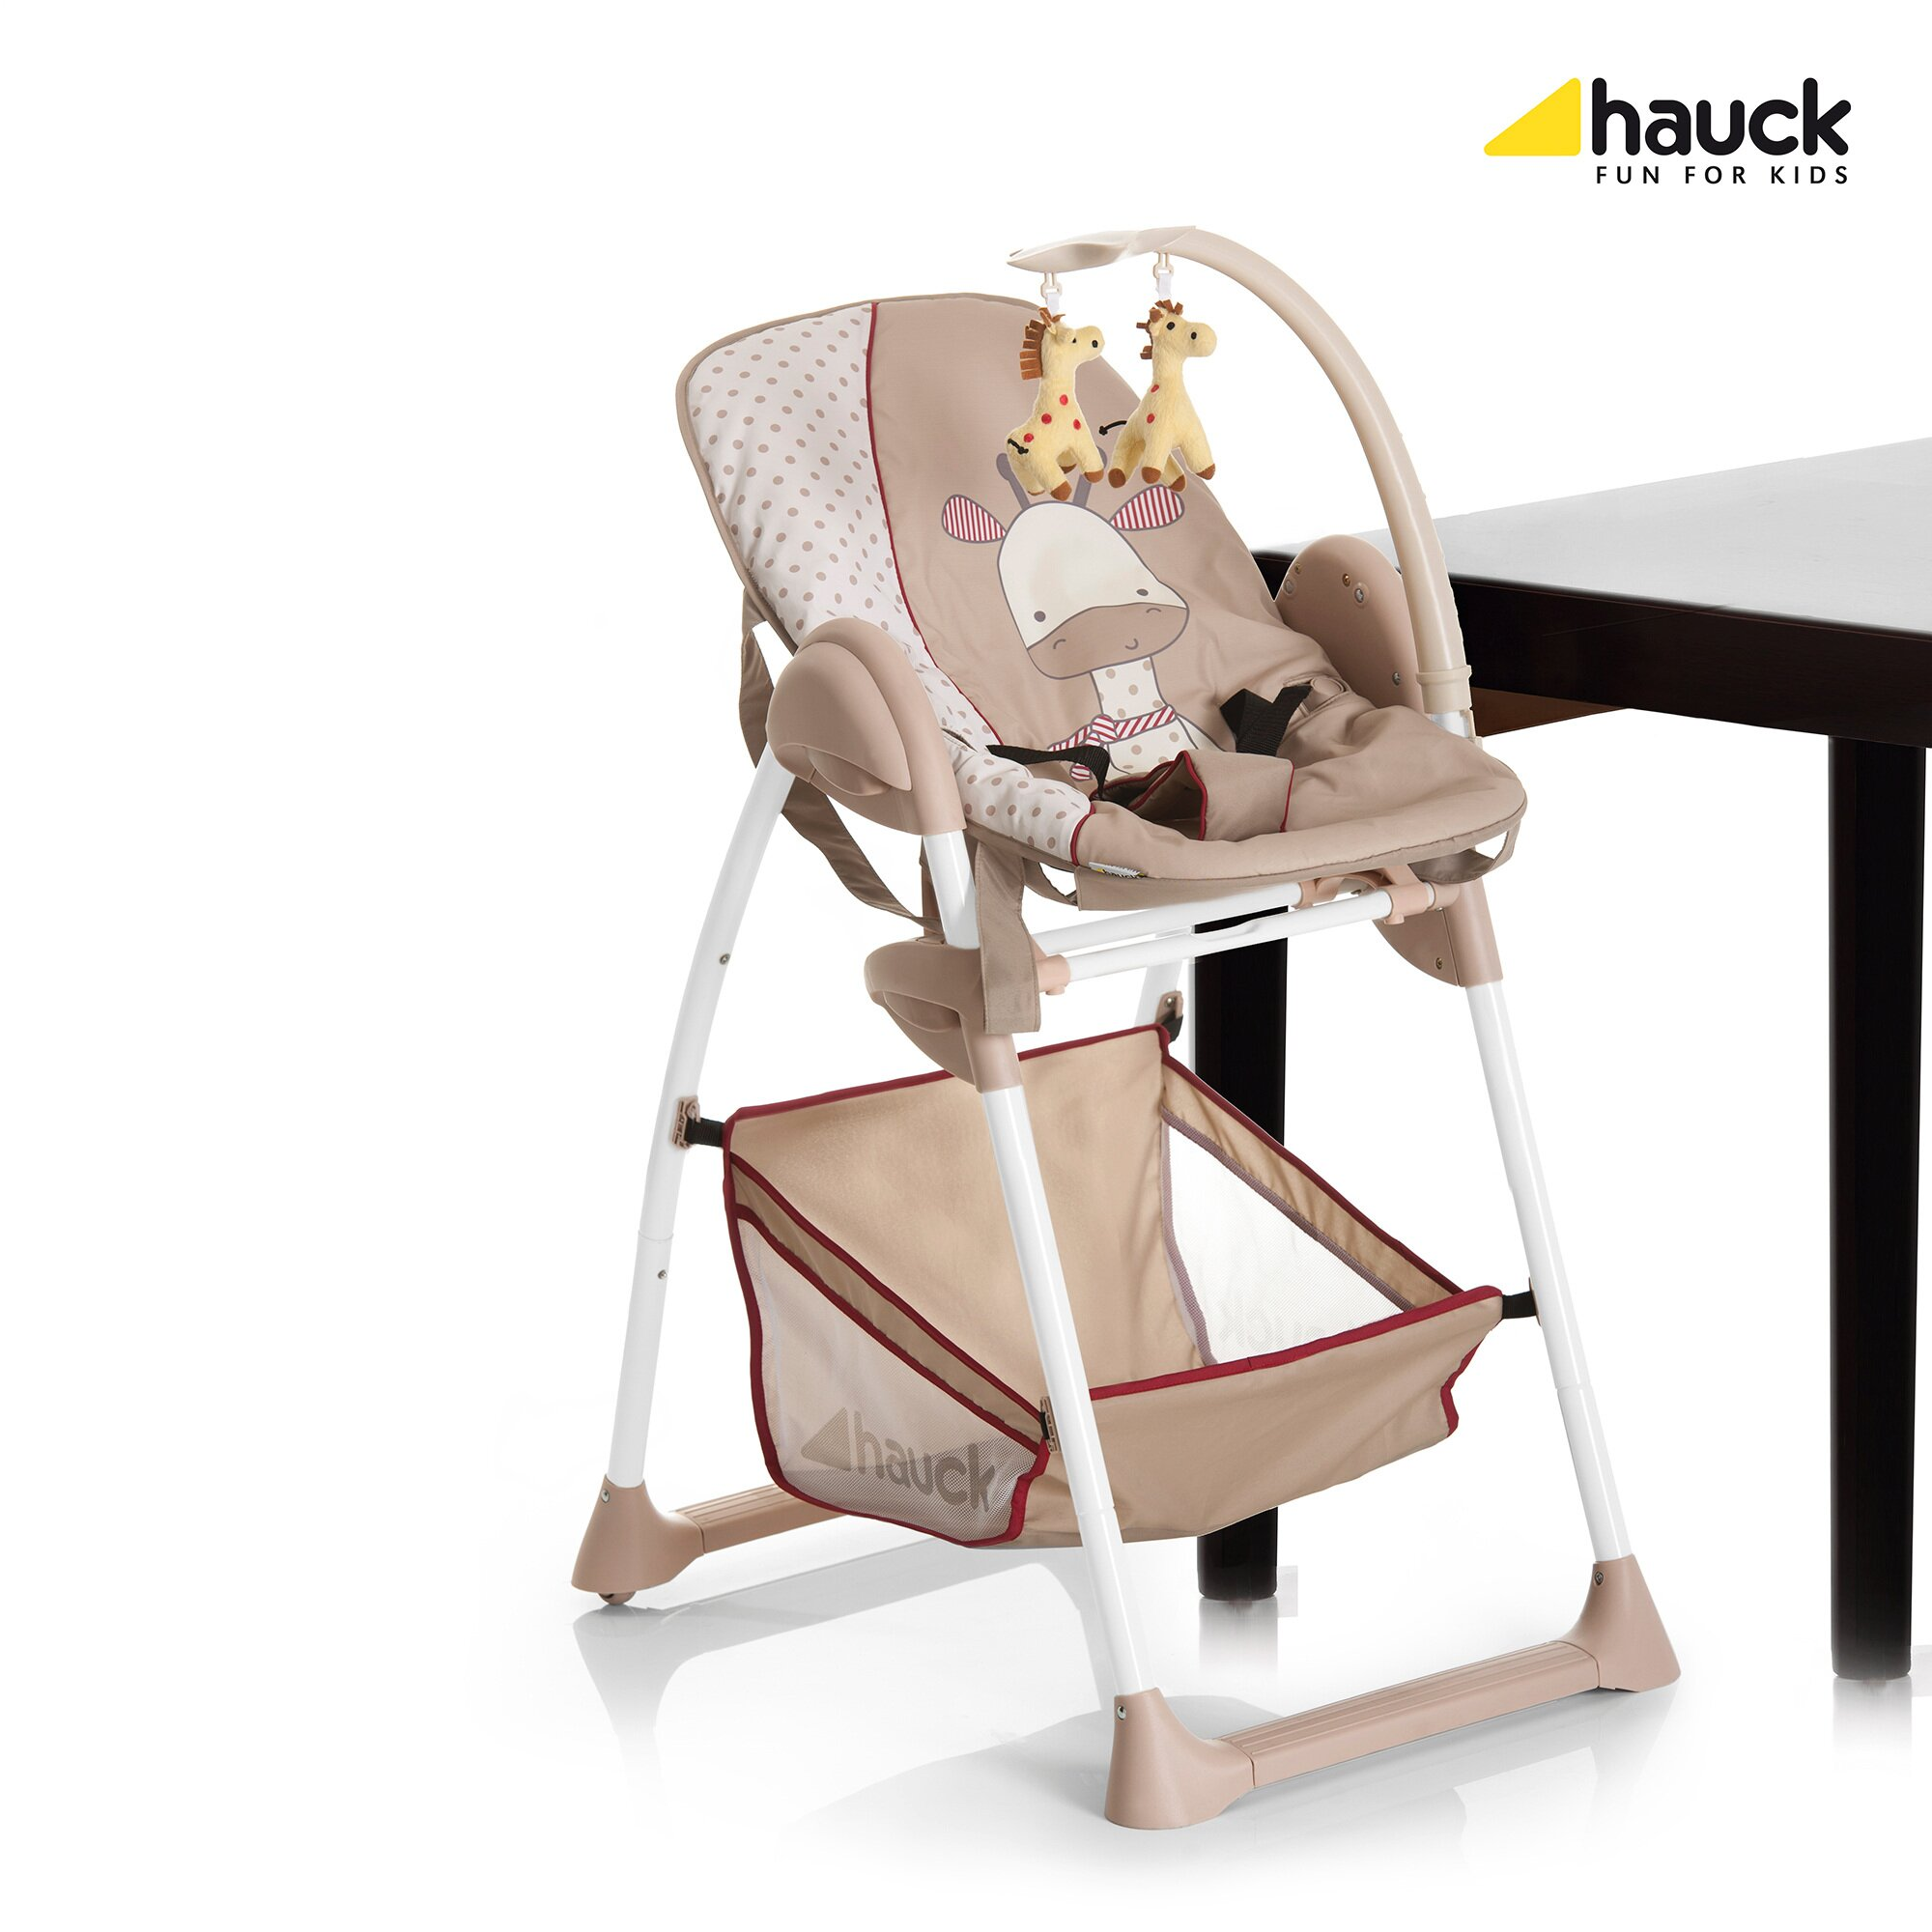 hauck-hochstuhl-sit-n-relax-giraffe-beige